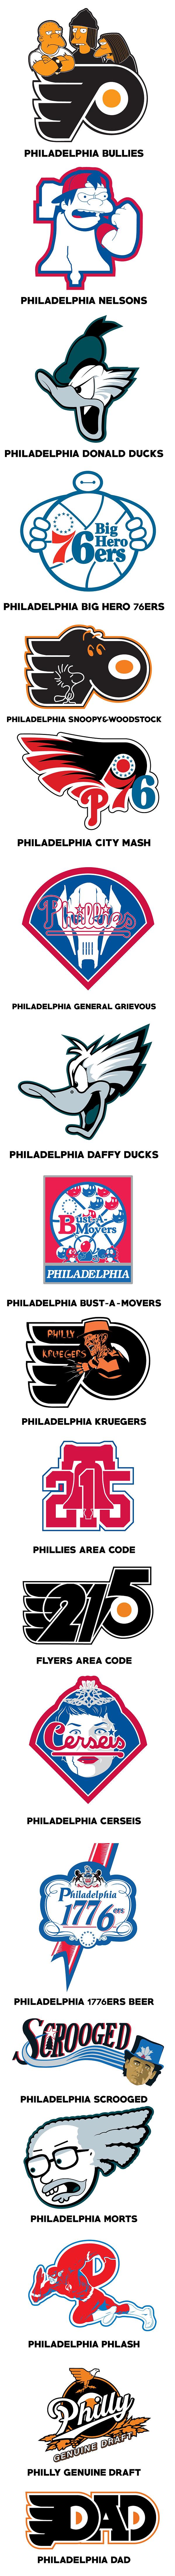 ALL_MASHUPS_Philadelphia.jpg